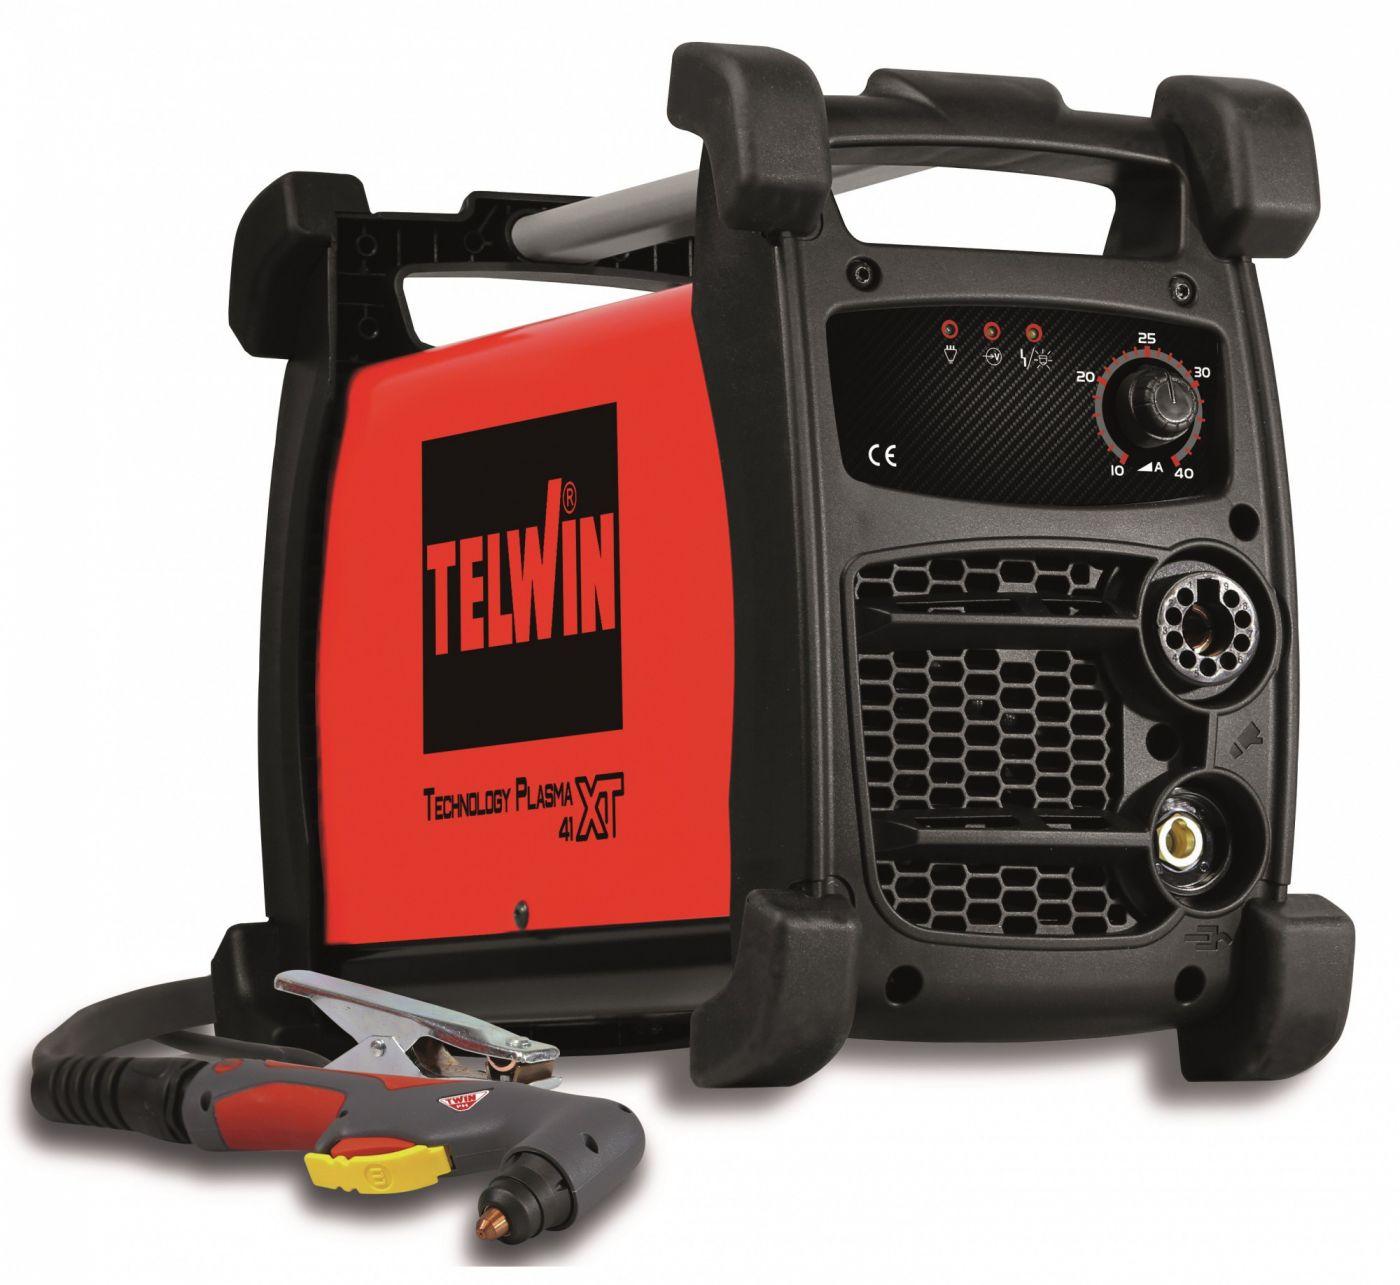 Аппарат плазменной резки Technology PLASMA 41 XT 230 V (816146)